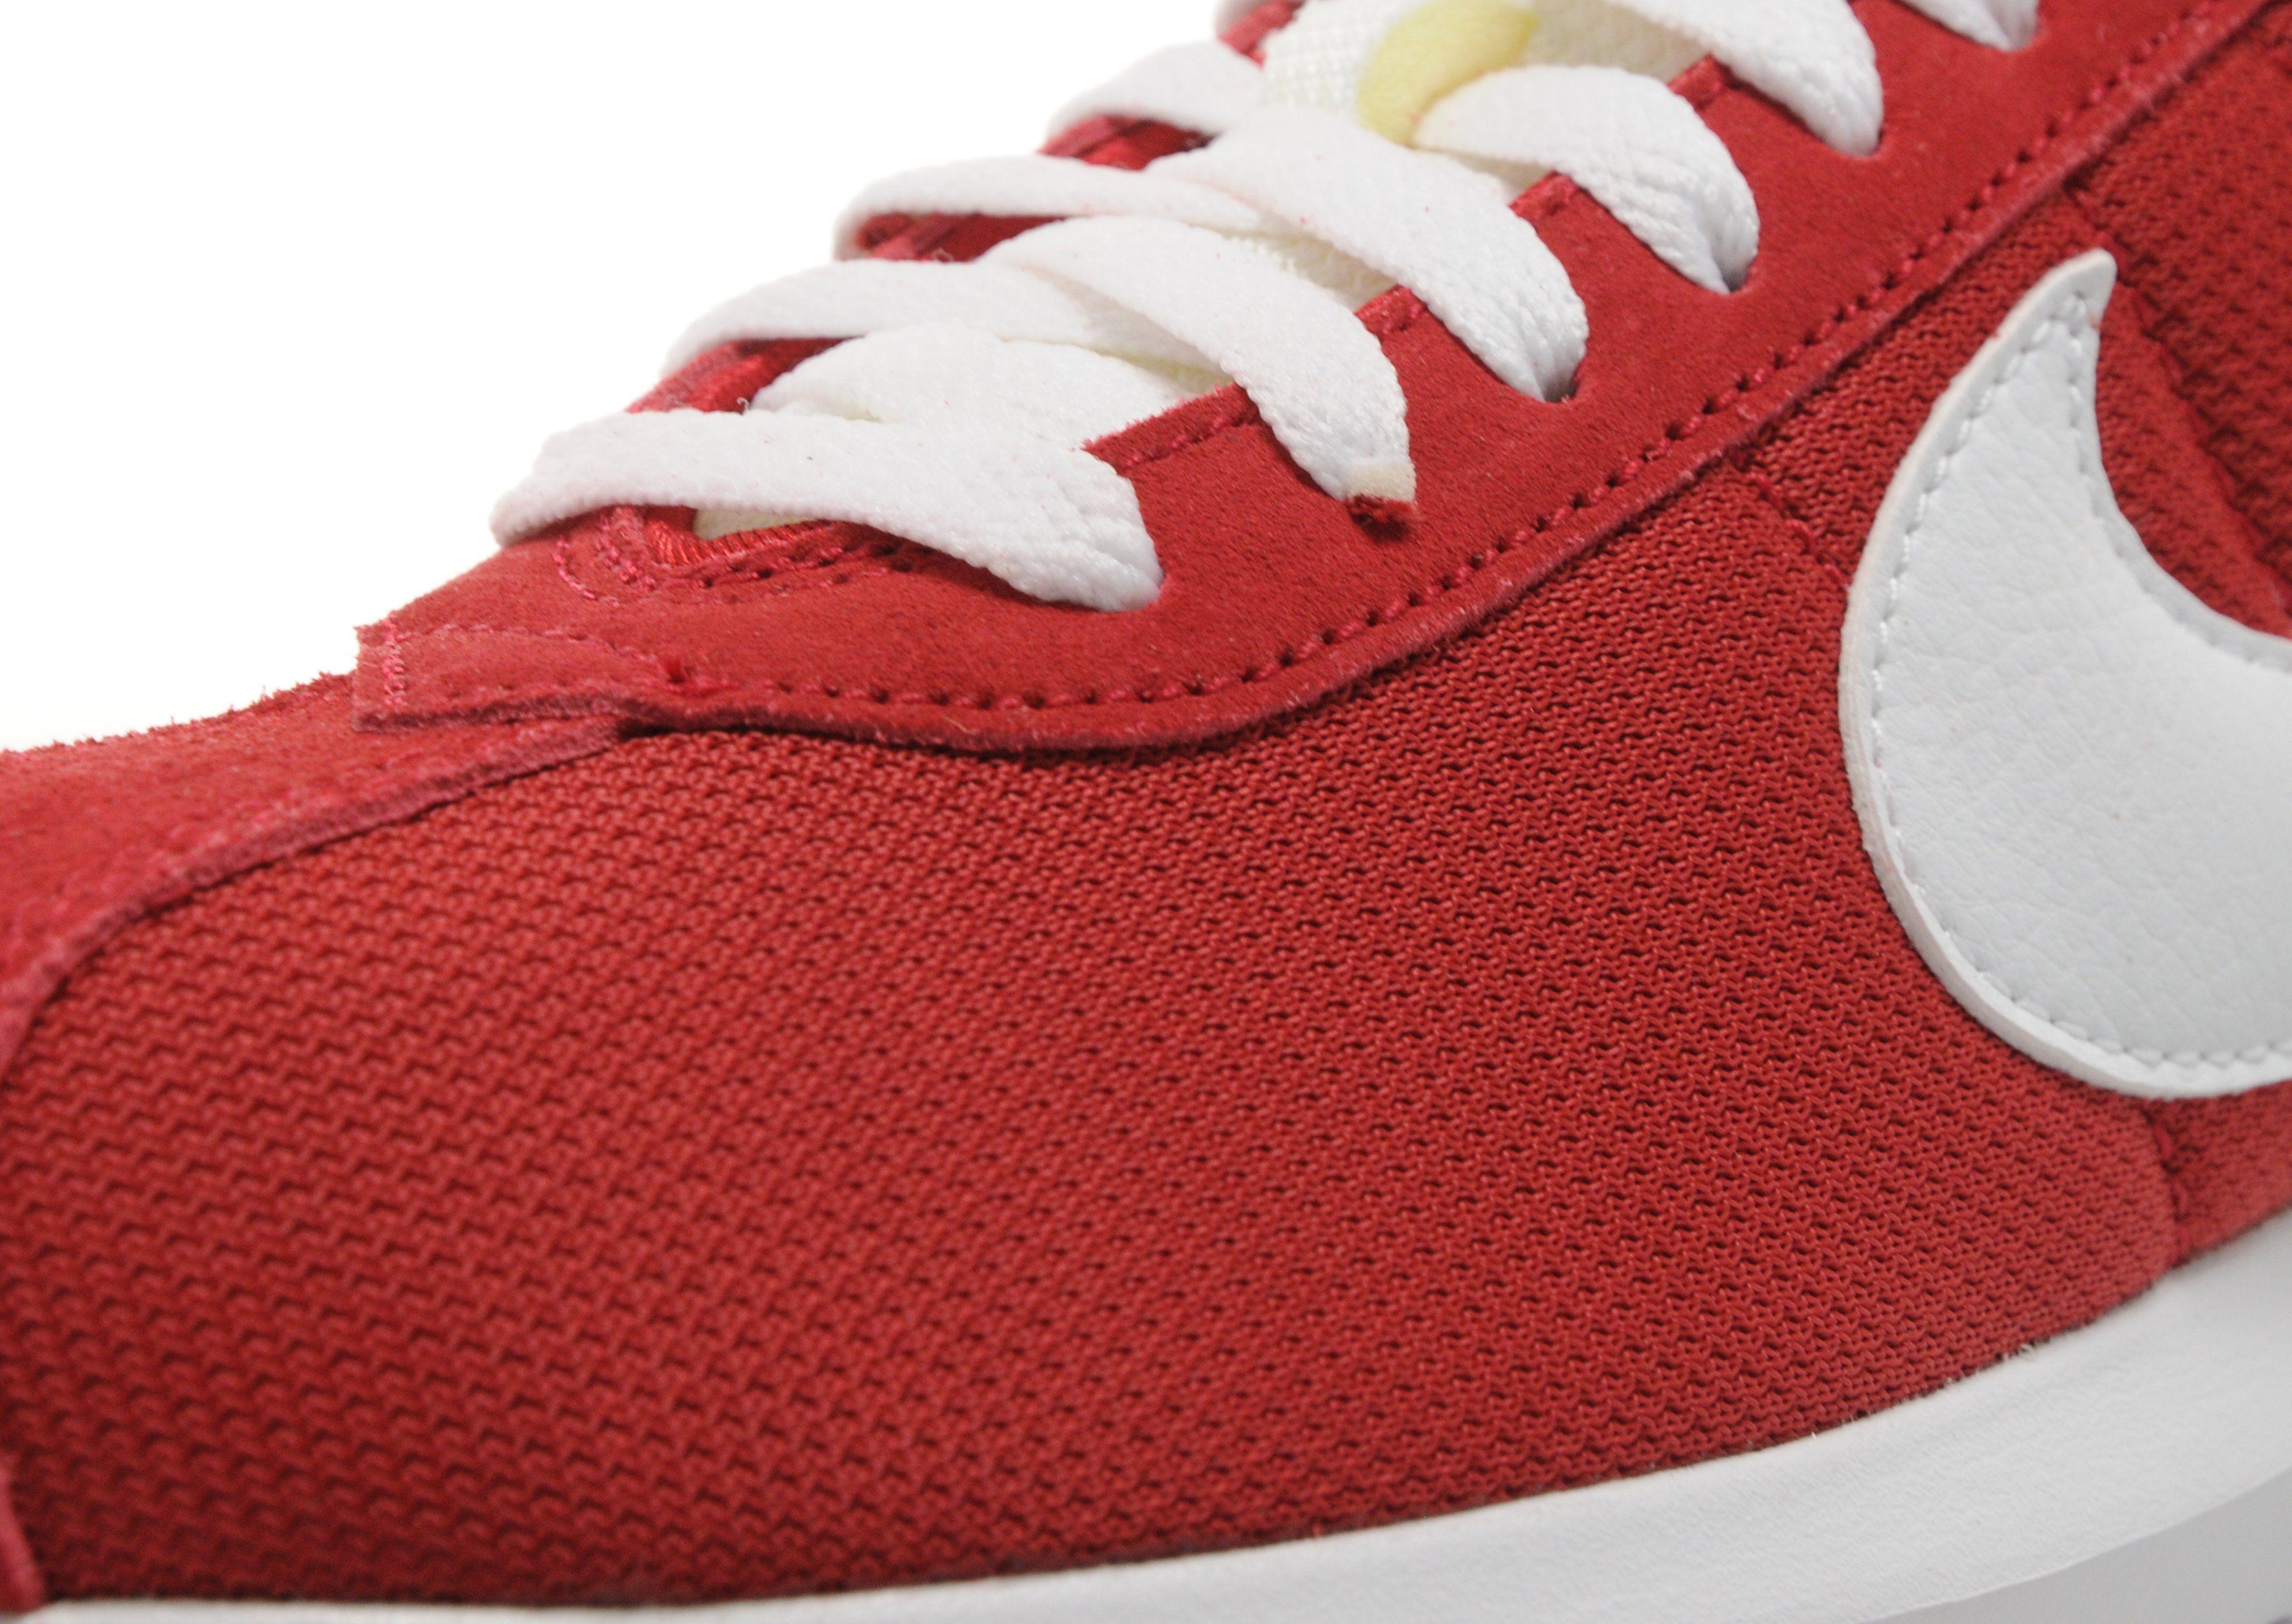 stplq Nike Roshe LD1000 QS | JD Sports